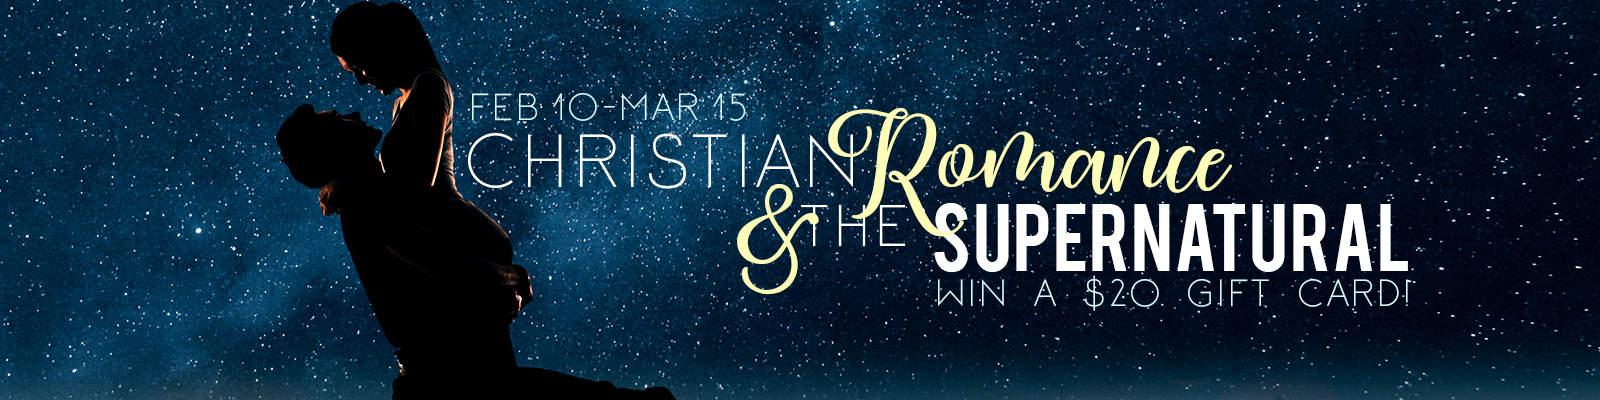 Christian Romance & the Supernatural